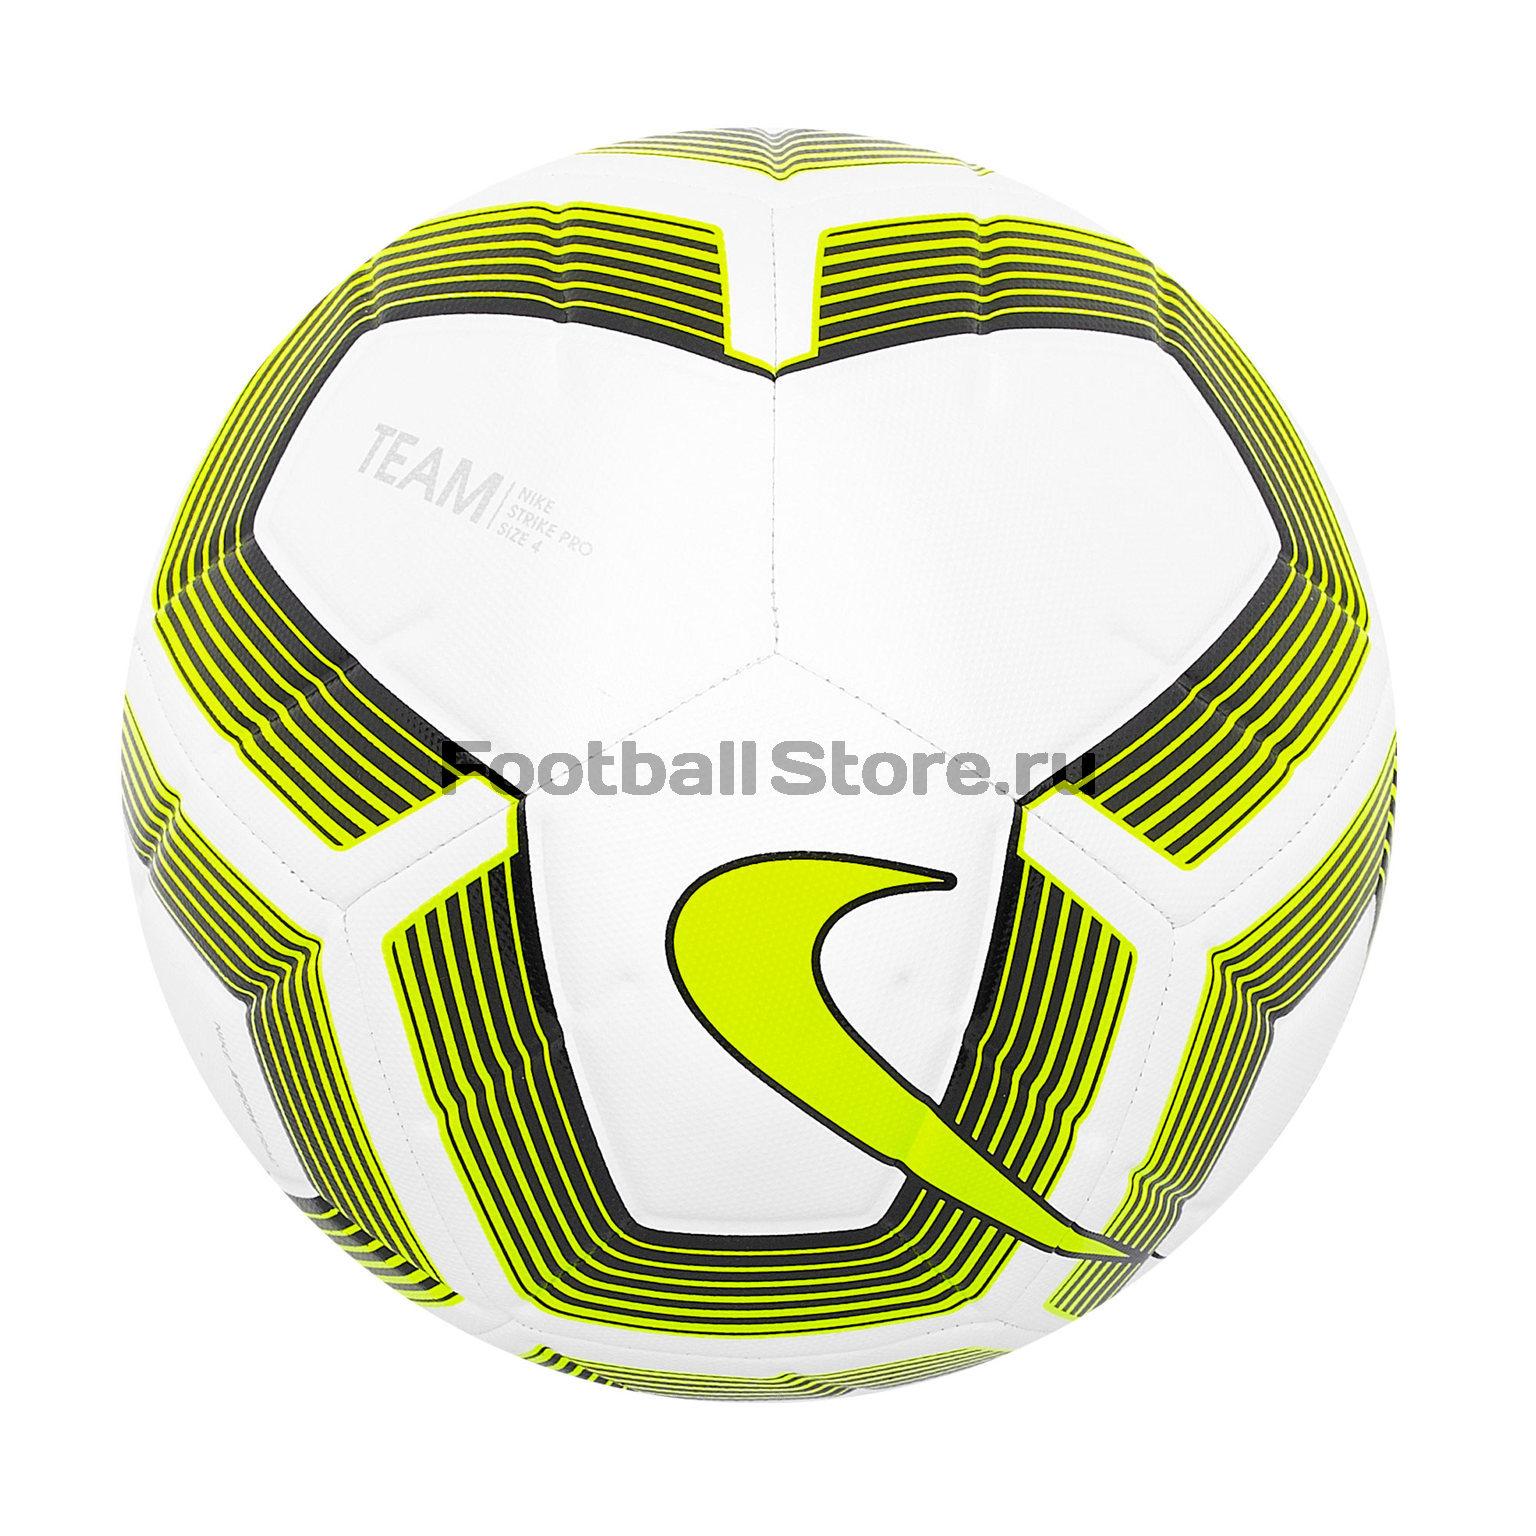 Футбольный мяч Nike Strike Pro TM SC3936-100 футбольный мяч nike nk strike team 290g sc3127 100